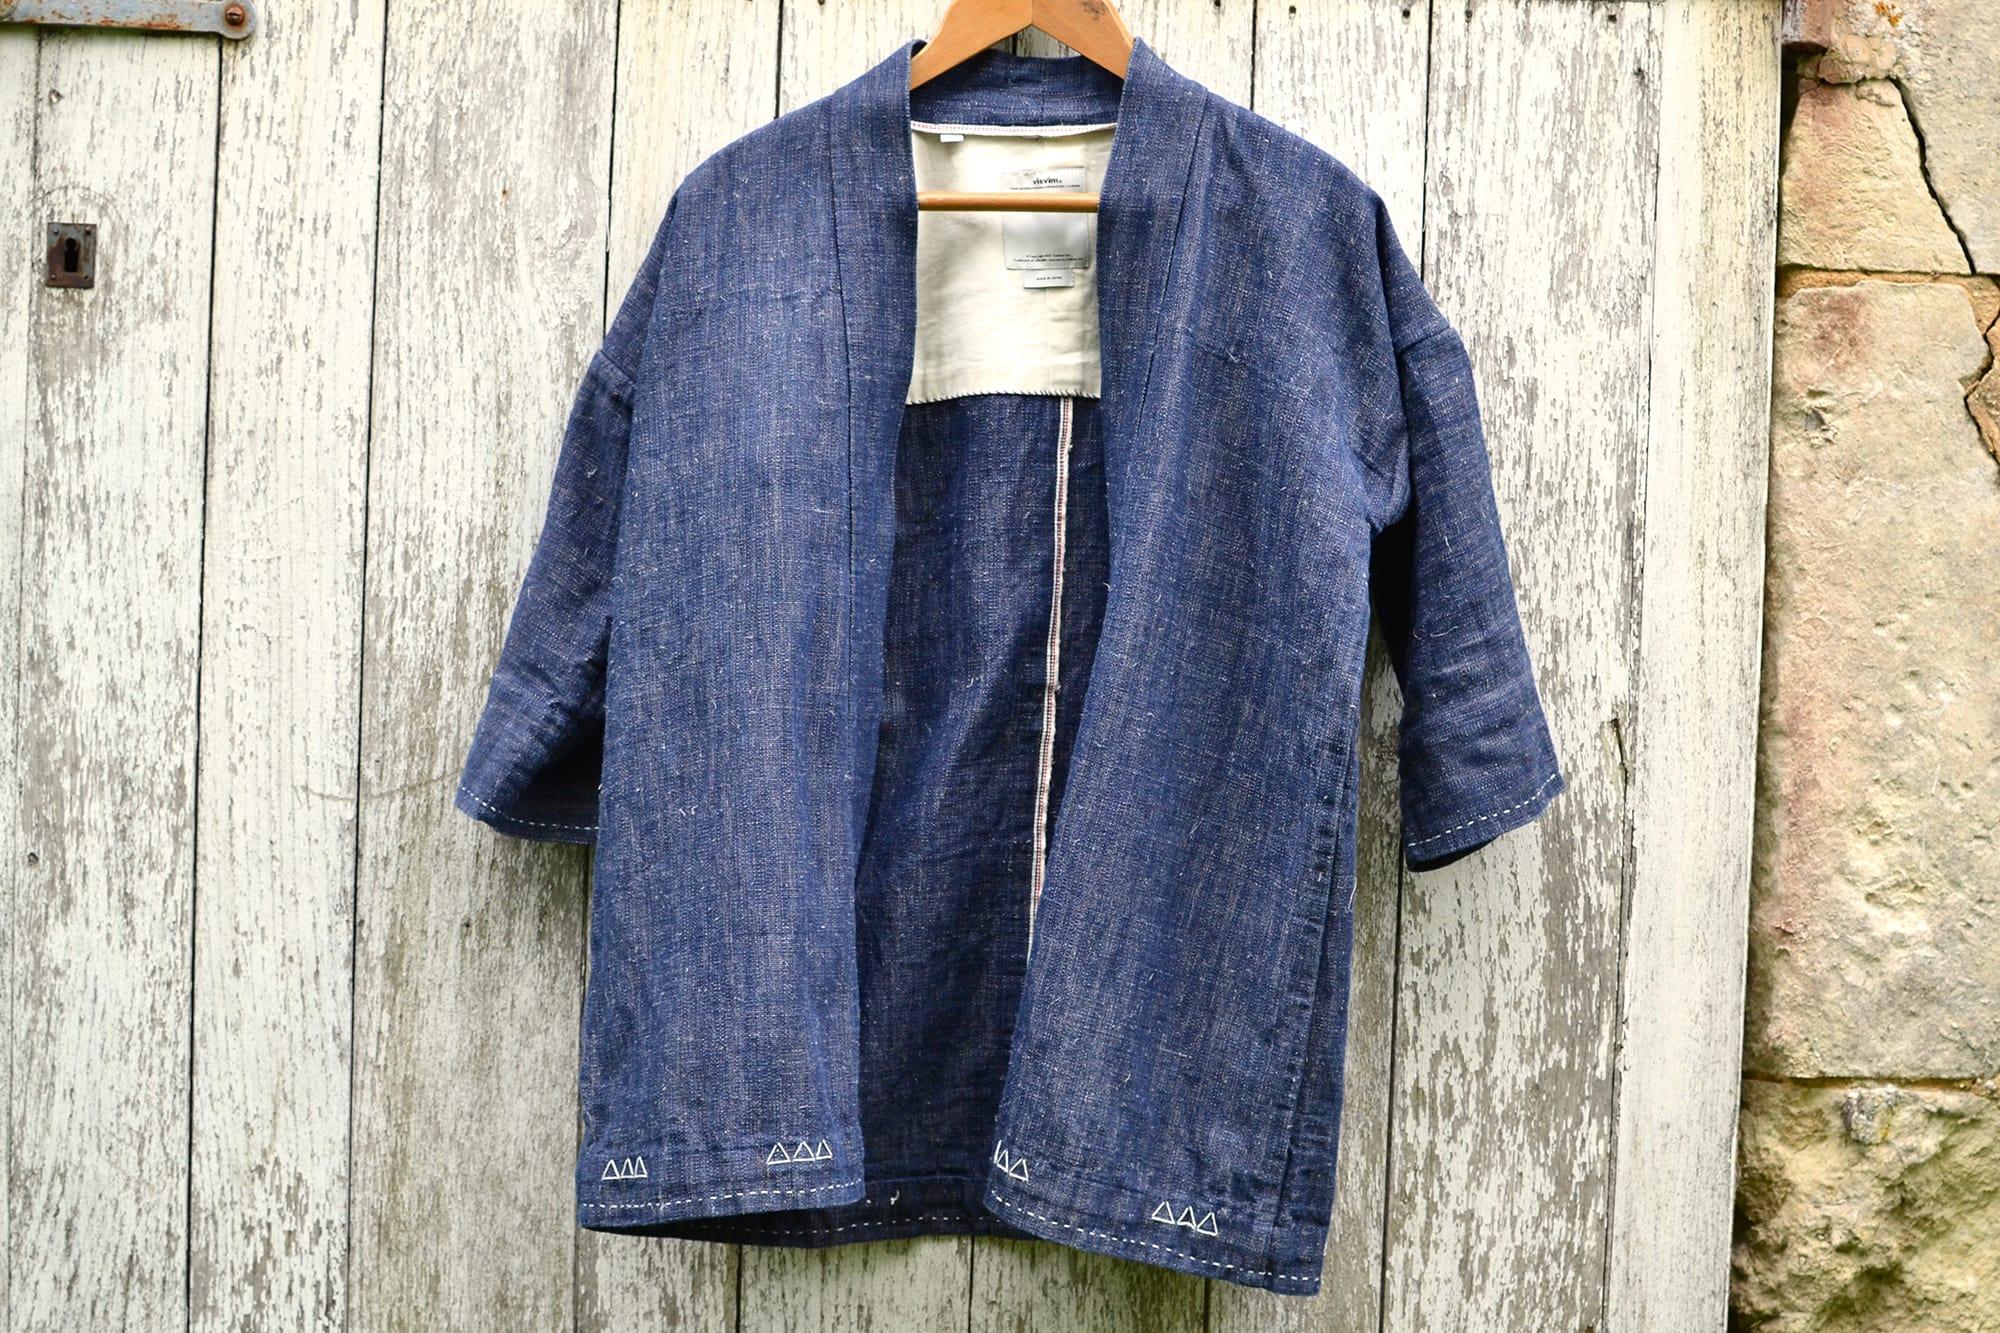 Visvim Sanjuro Kimono ( Luxsic-Linen ) Color- Indigo Dyed) - 1